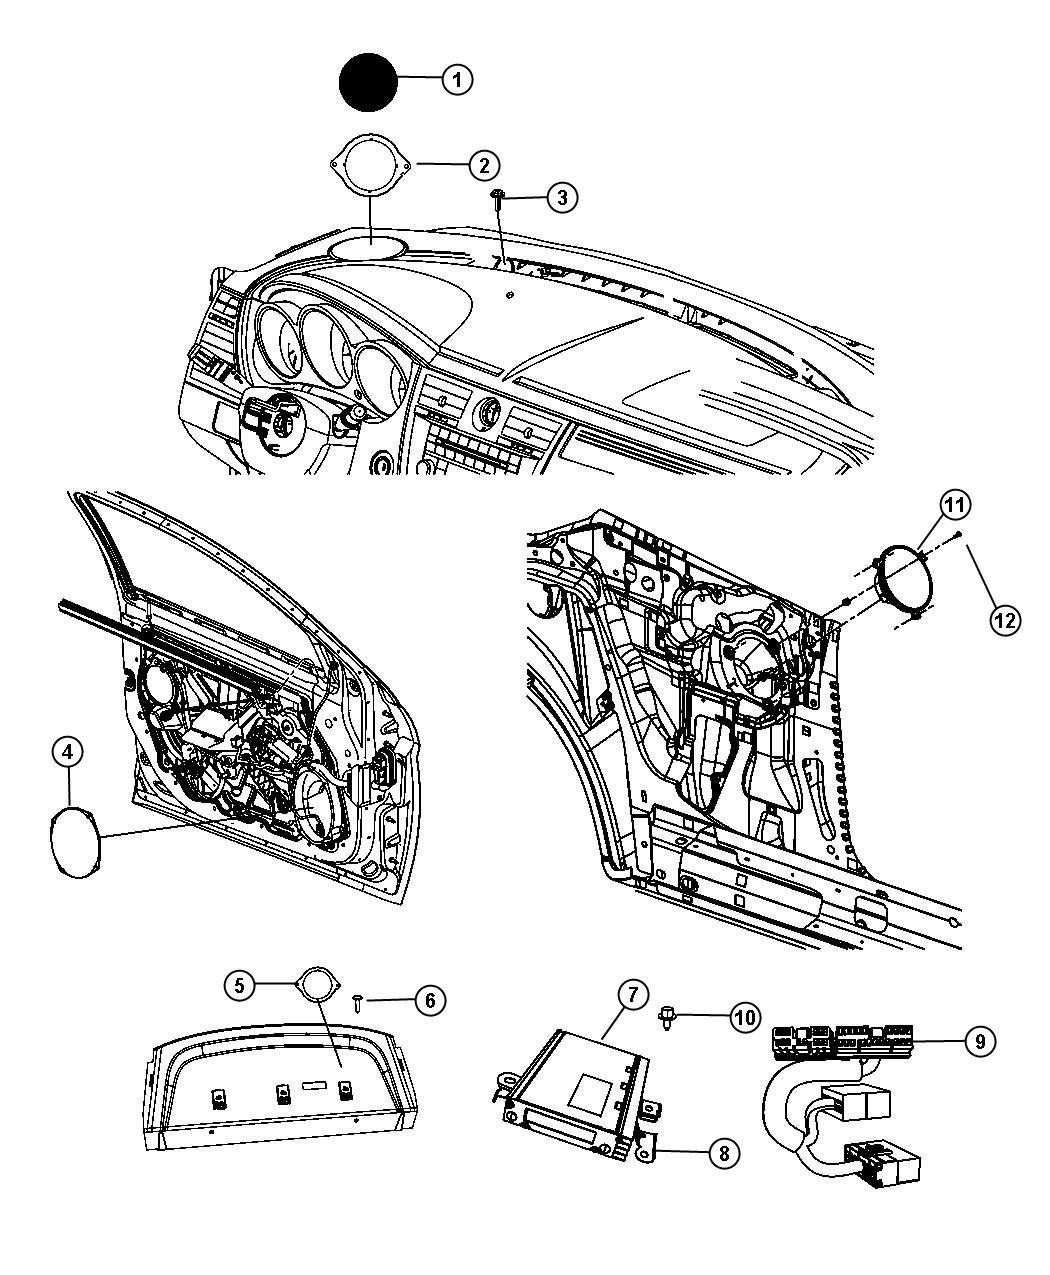 2009 Chrysler Sebring Wiring. Jumper. Amplifier. [6 boston